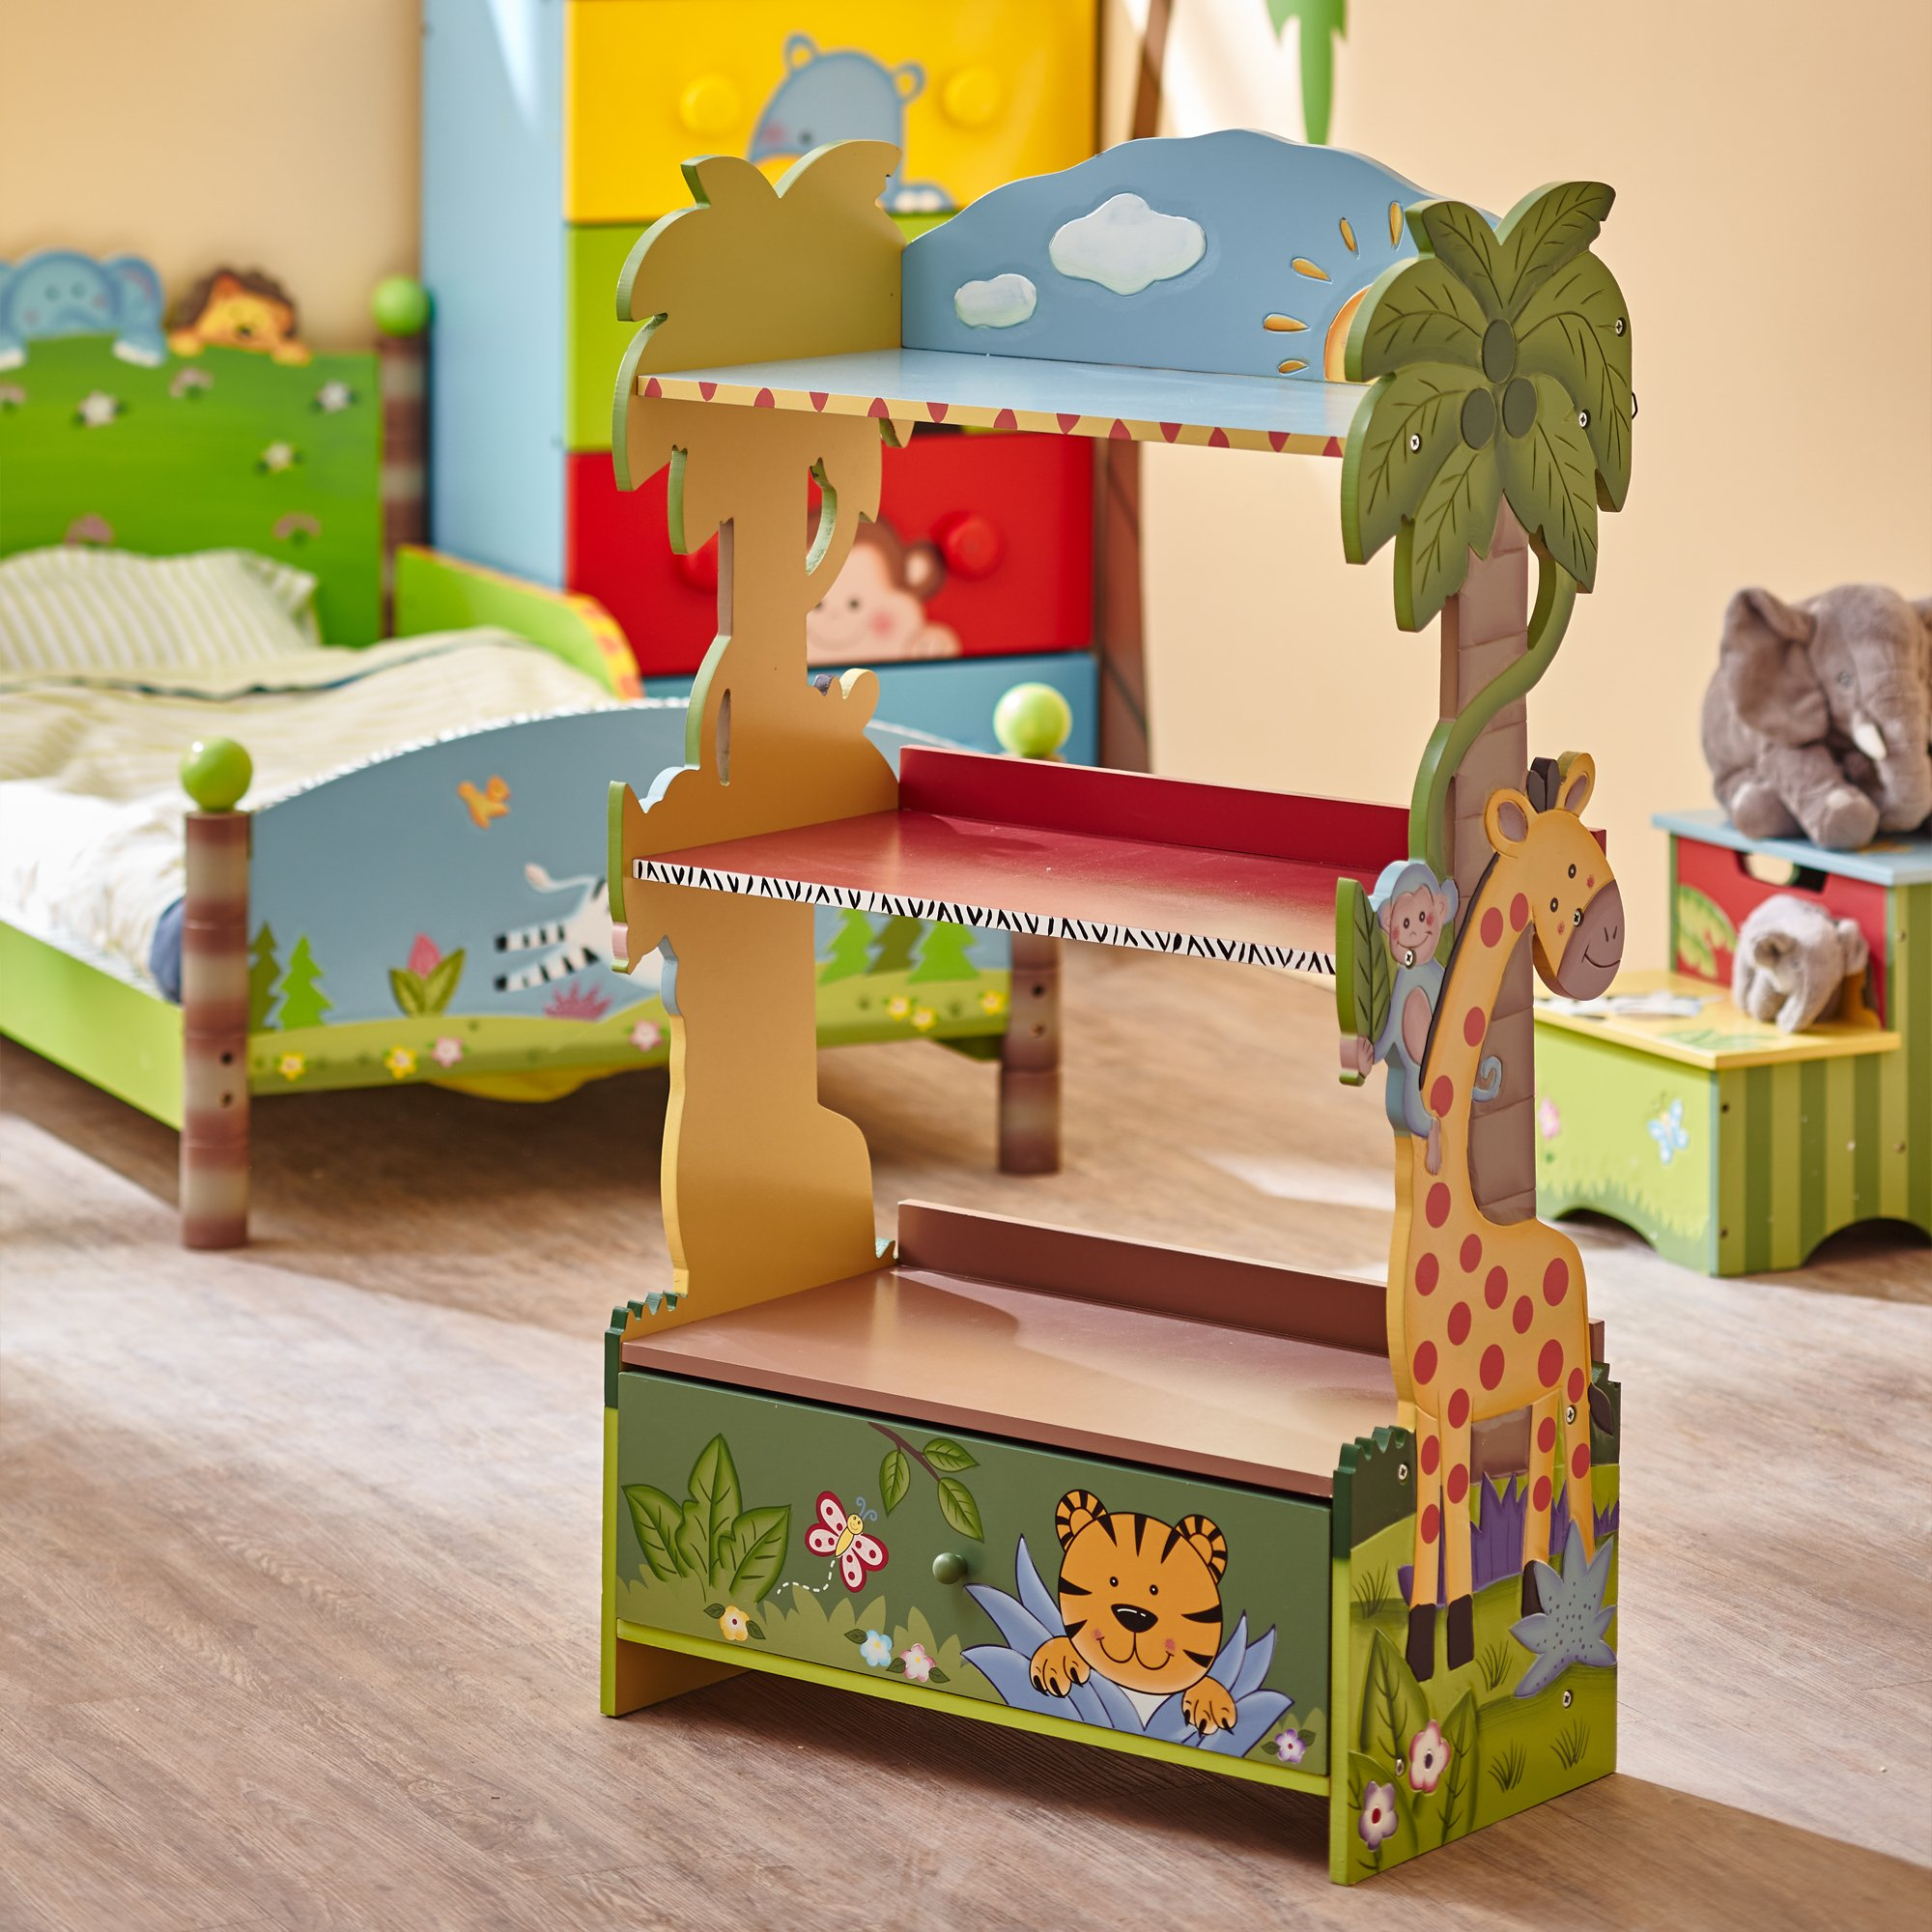 Fantasy Fields W-8268A  Sunny Safari Hand Crafted Kids Wooden Bookshelf, Green, 21.9 x 11.5 x 38